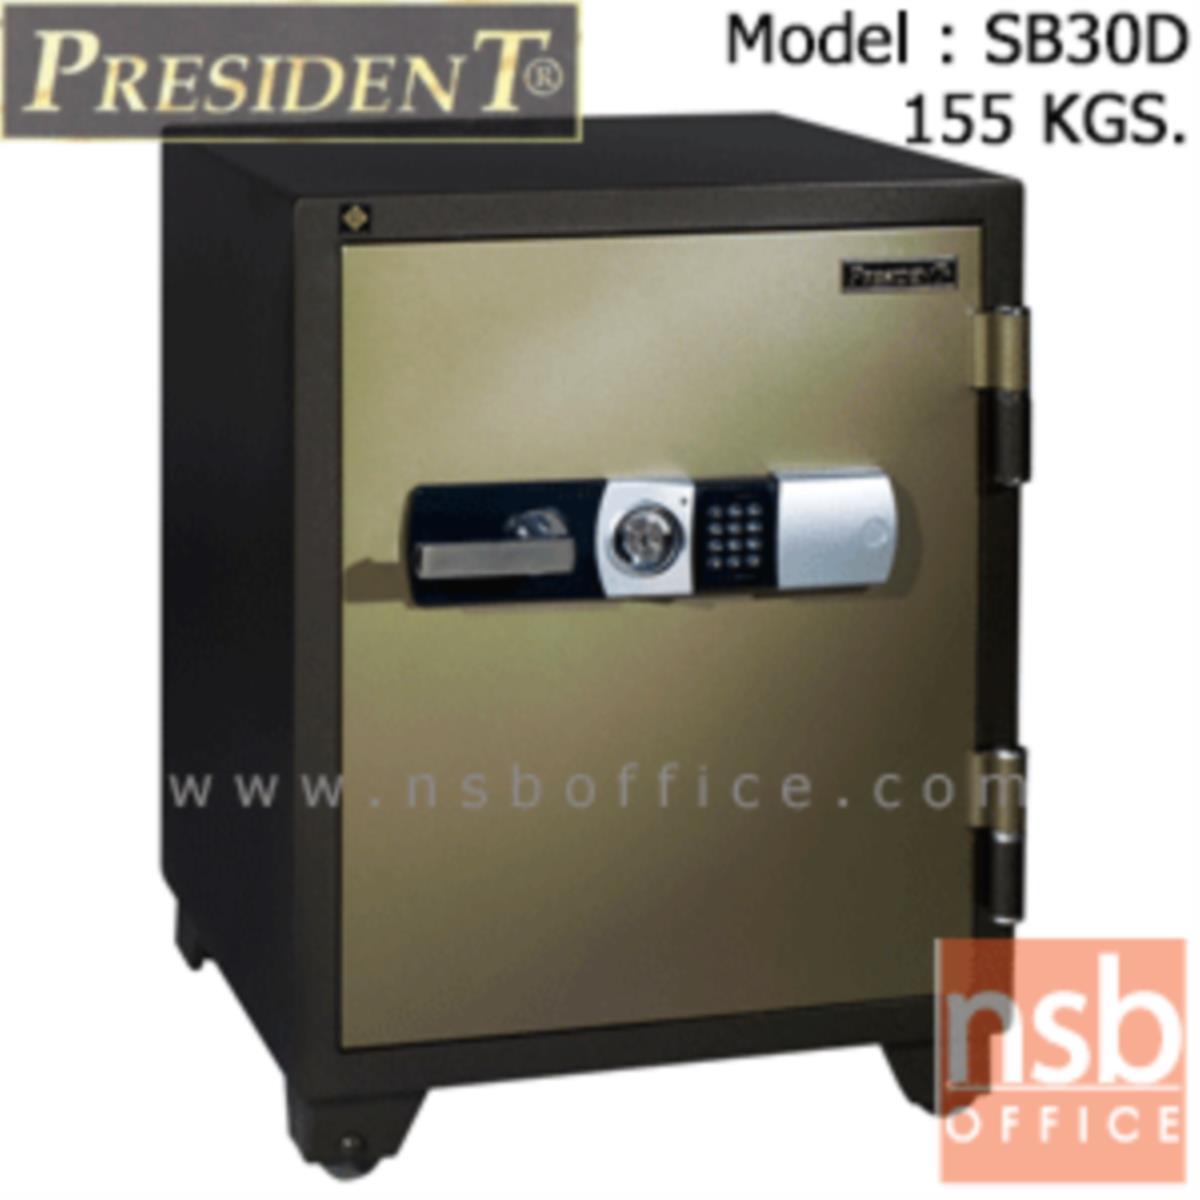 F05A014:ตู้เซฟนิรภัยชนิดดิจิตอล 155 กก. รุ่น PRESIDENT-SB30D มี 1 กุญแจ 1 รหัส (รหัสใช้กดหน้าตู้)